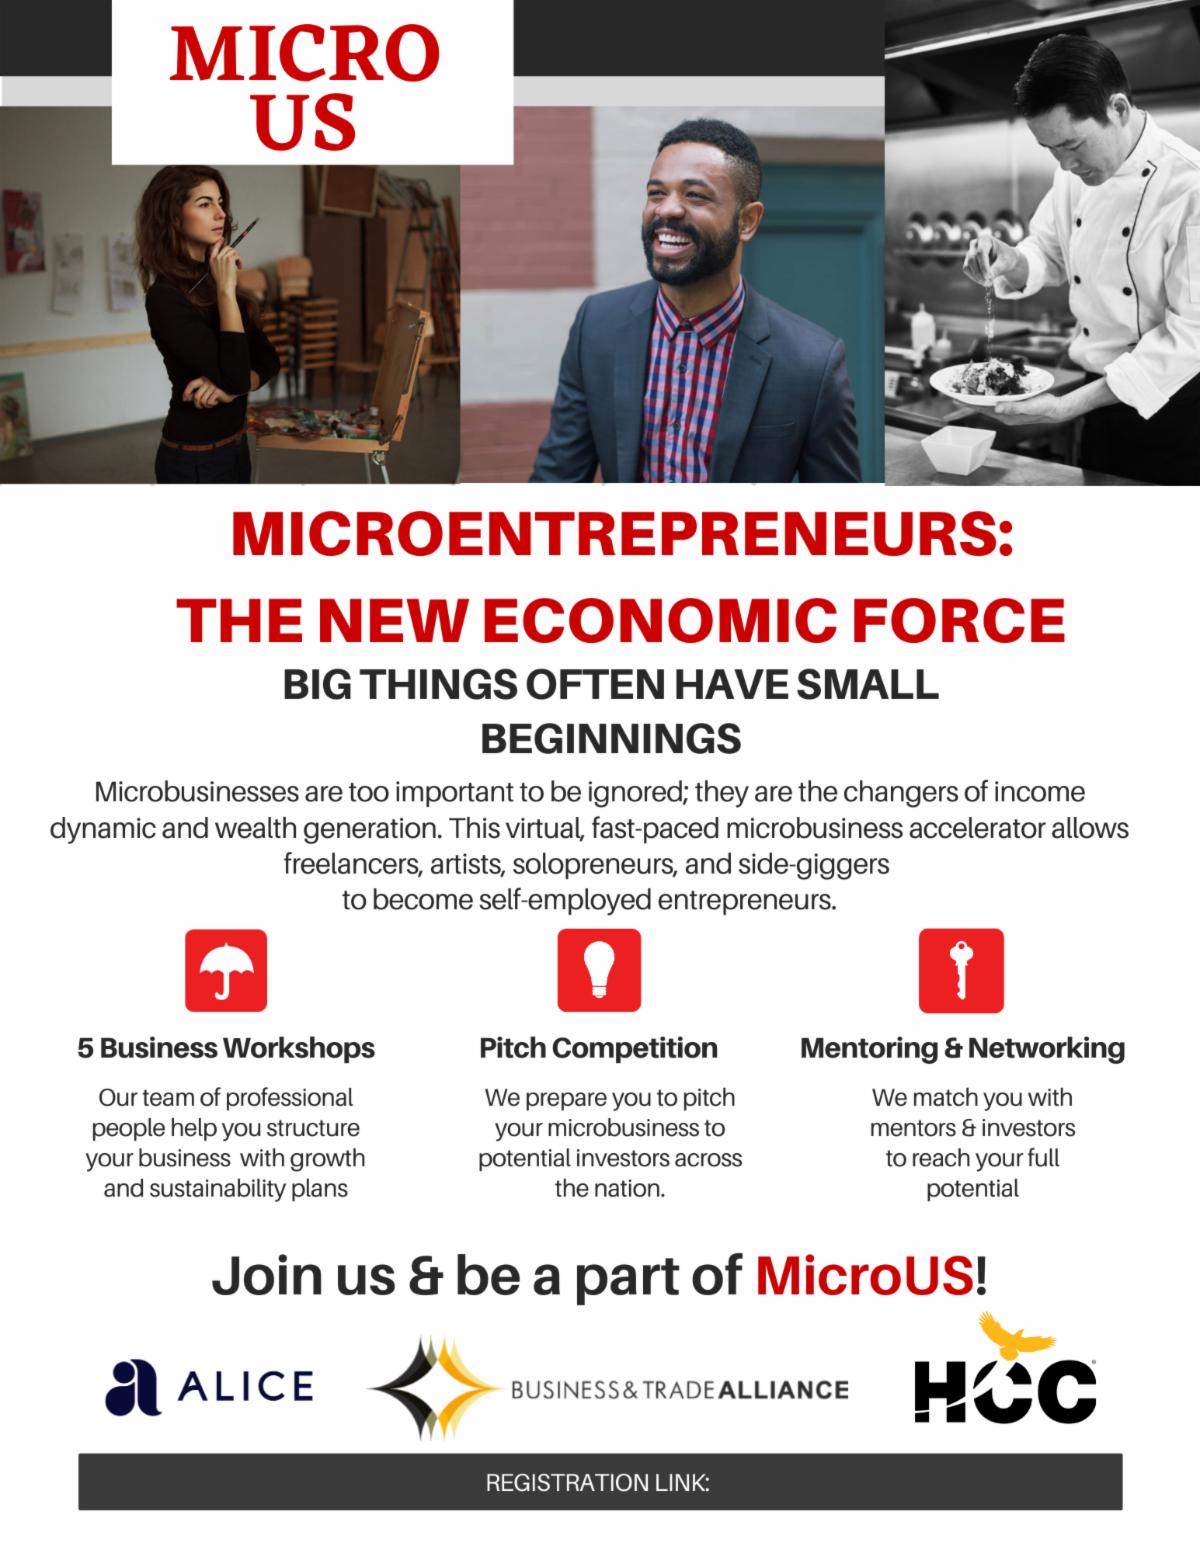 HCC Office of Entrepreneurial Initiatives - October 2020 Newsletter 23